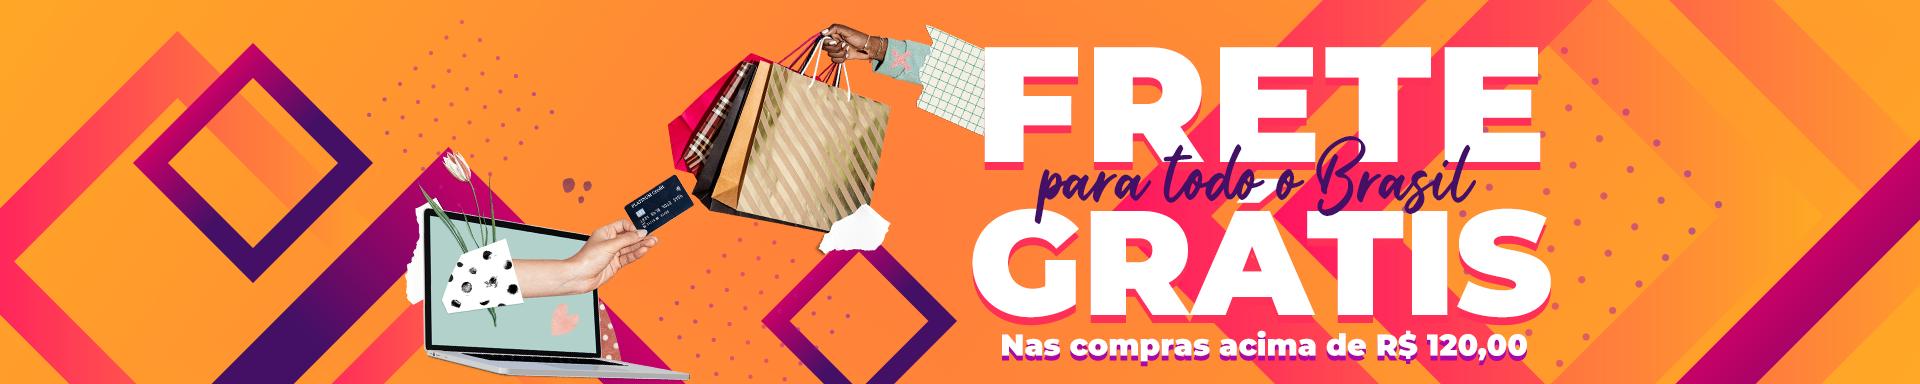 Banner- Frete Grátis